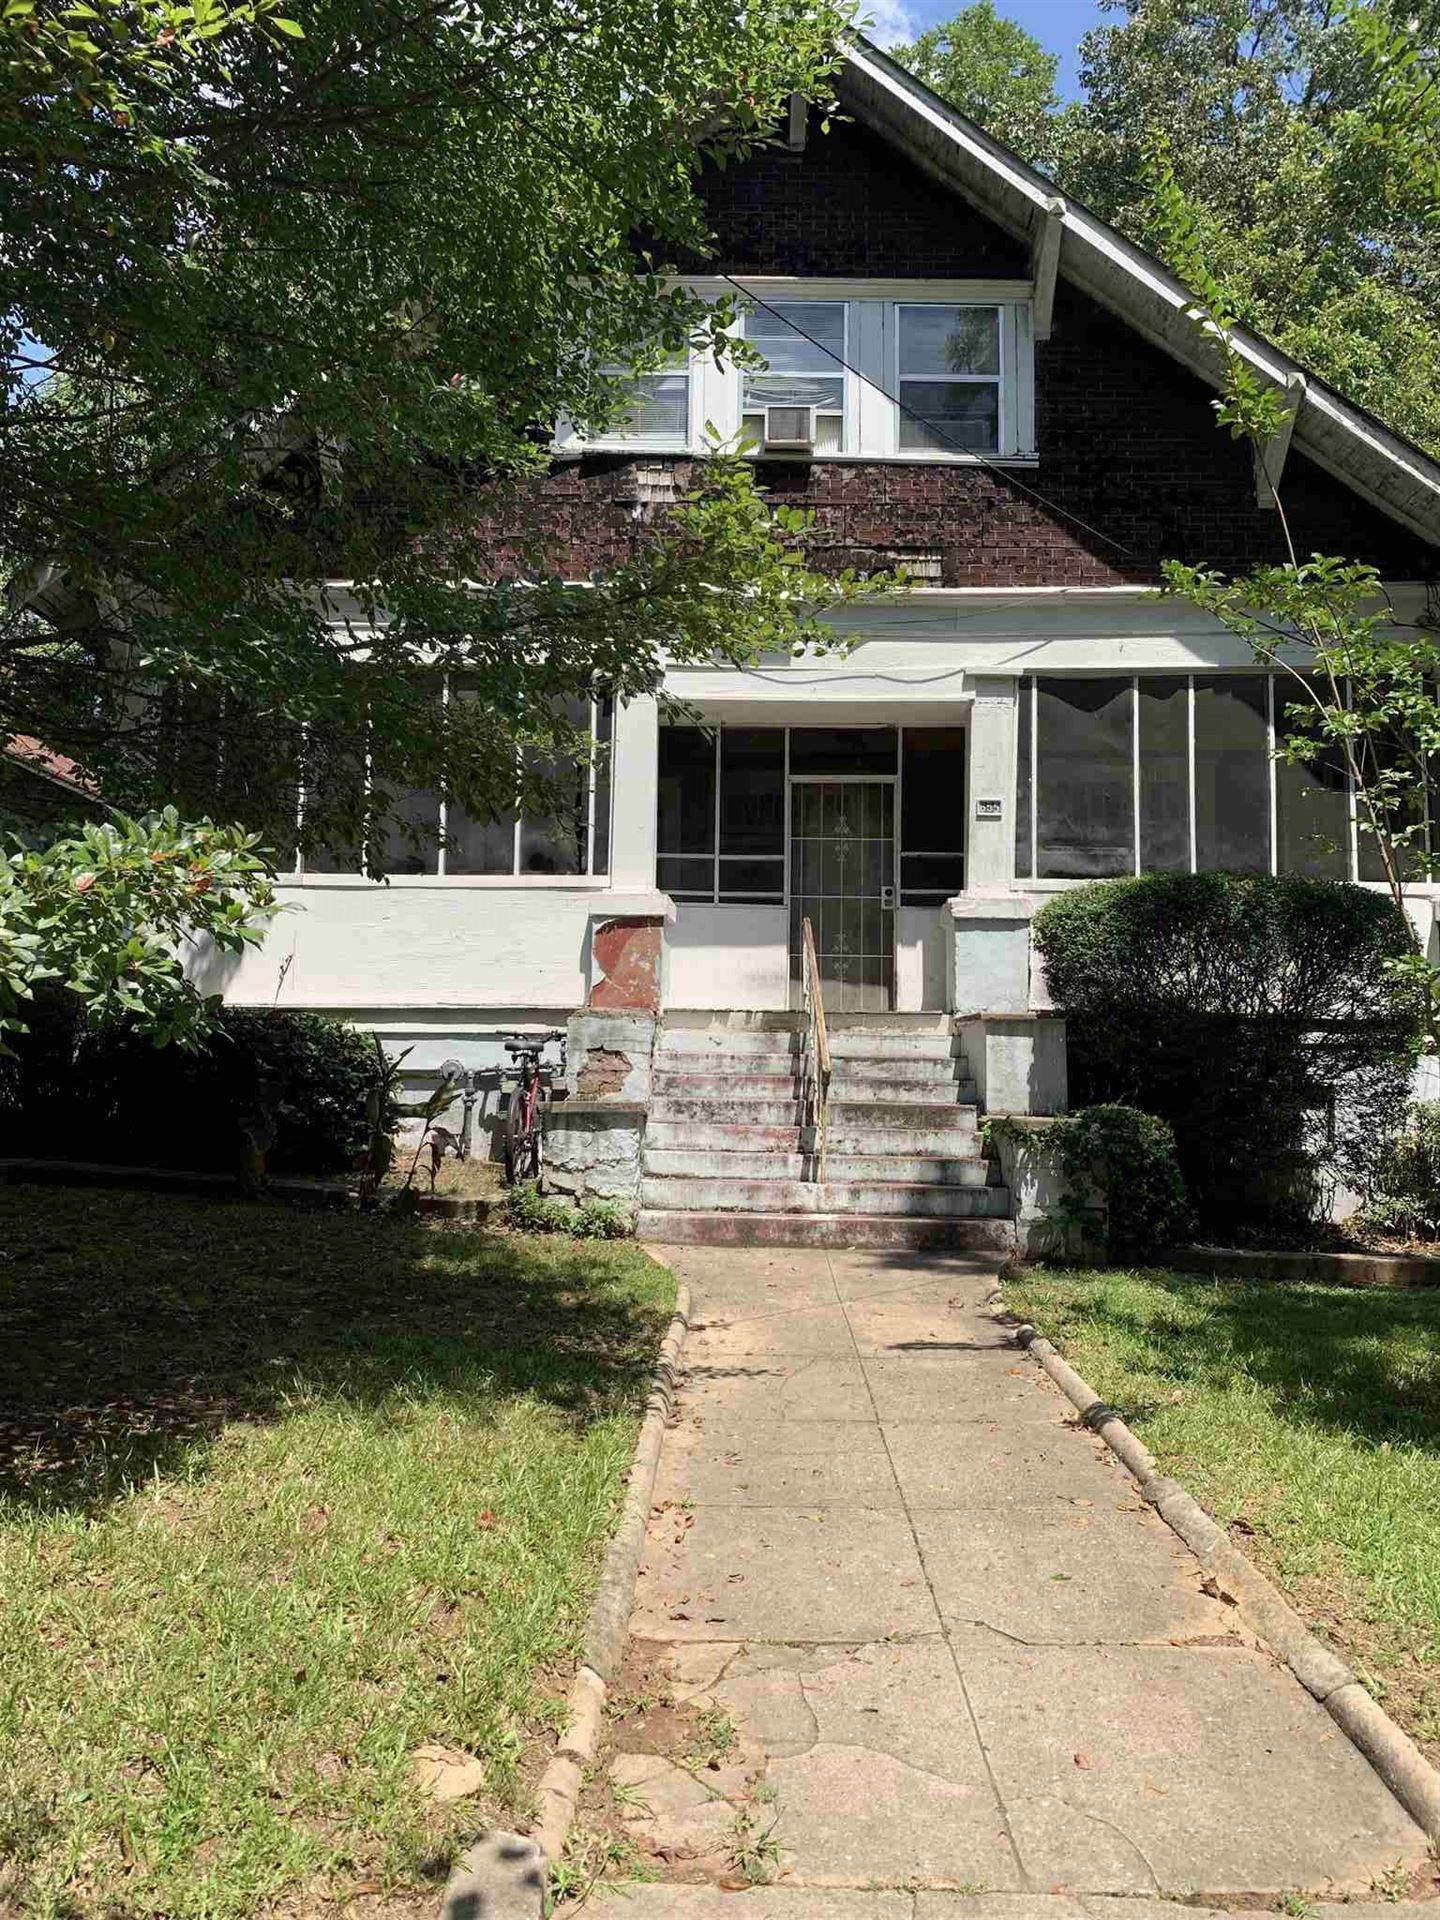 655 Brookline St, Atlanta, GA 30310 - #: 8850354